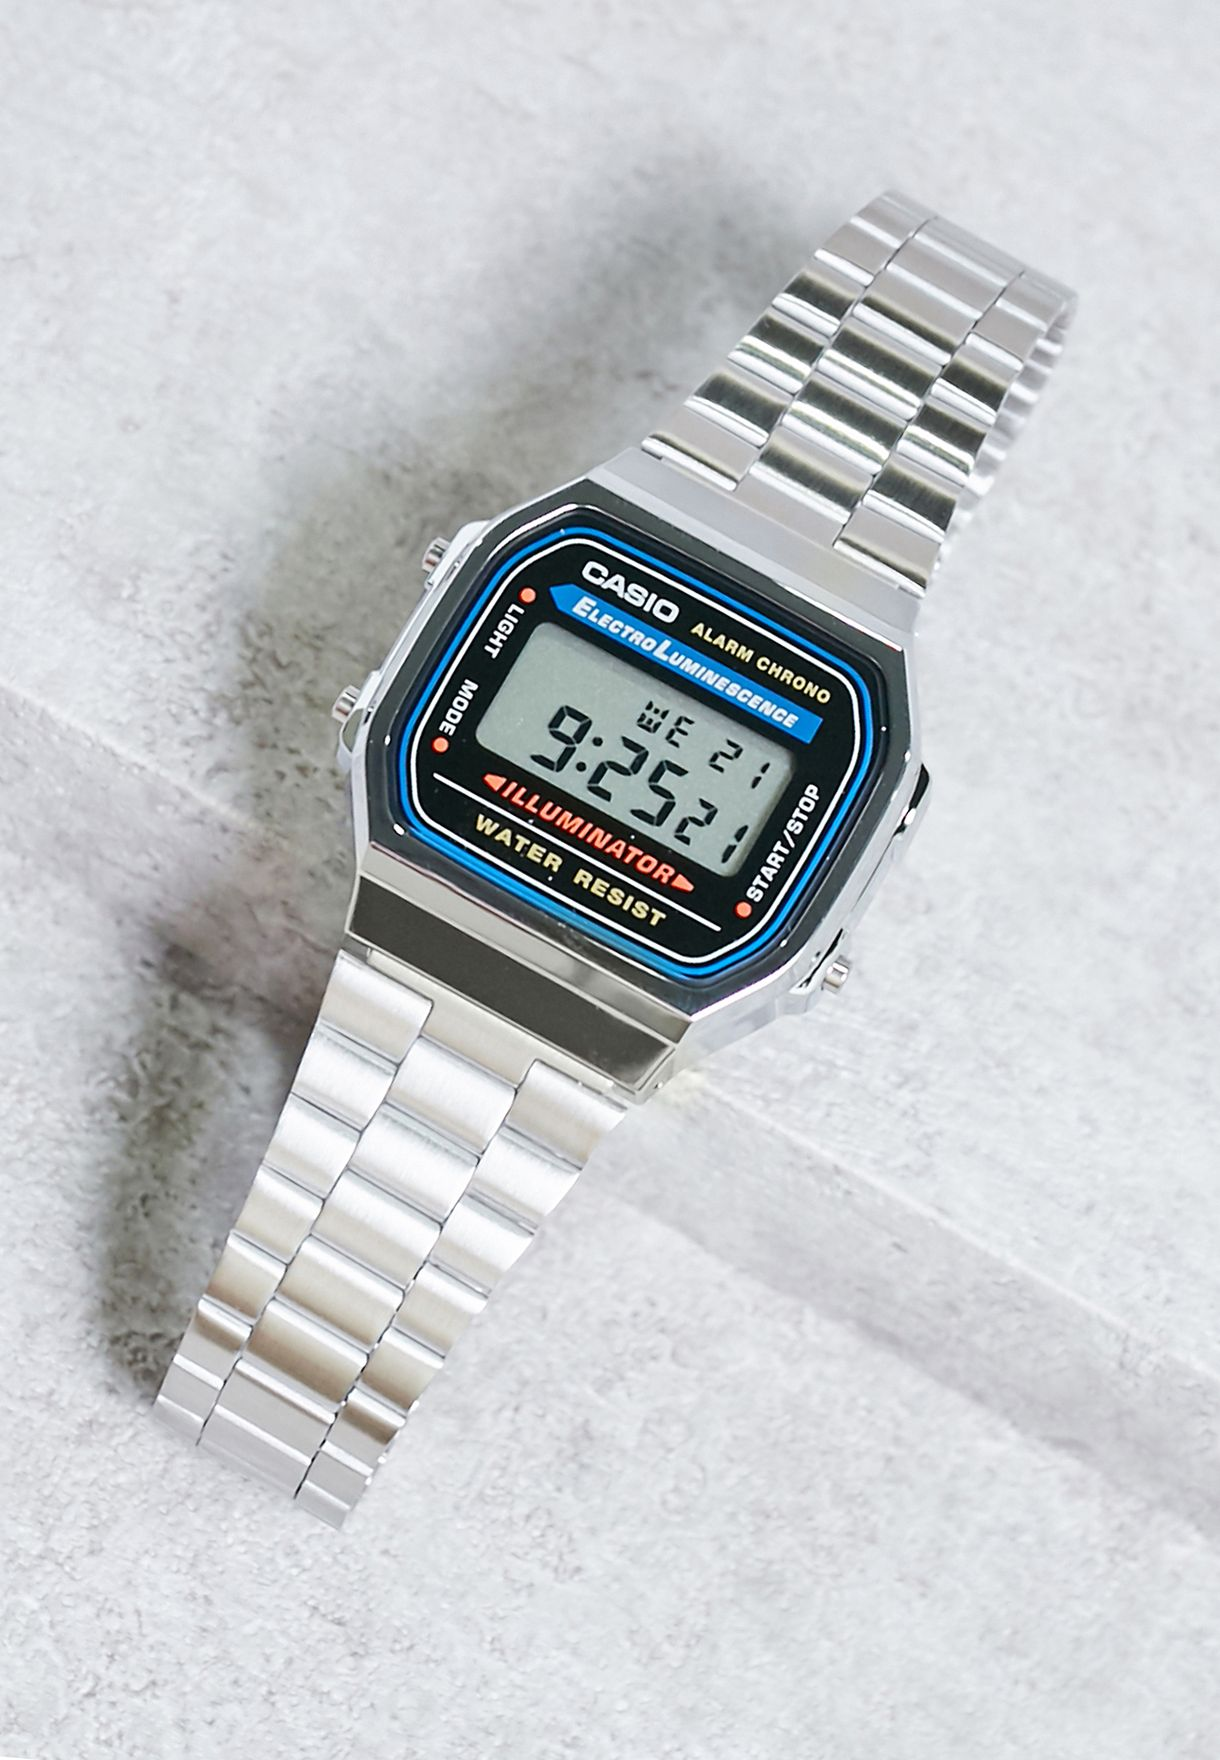 b32170f20 تسوق ساعة الكترونية ماركة كاسيو لون فضي A168WA-1WDF في السعودية ...